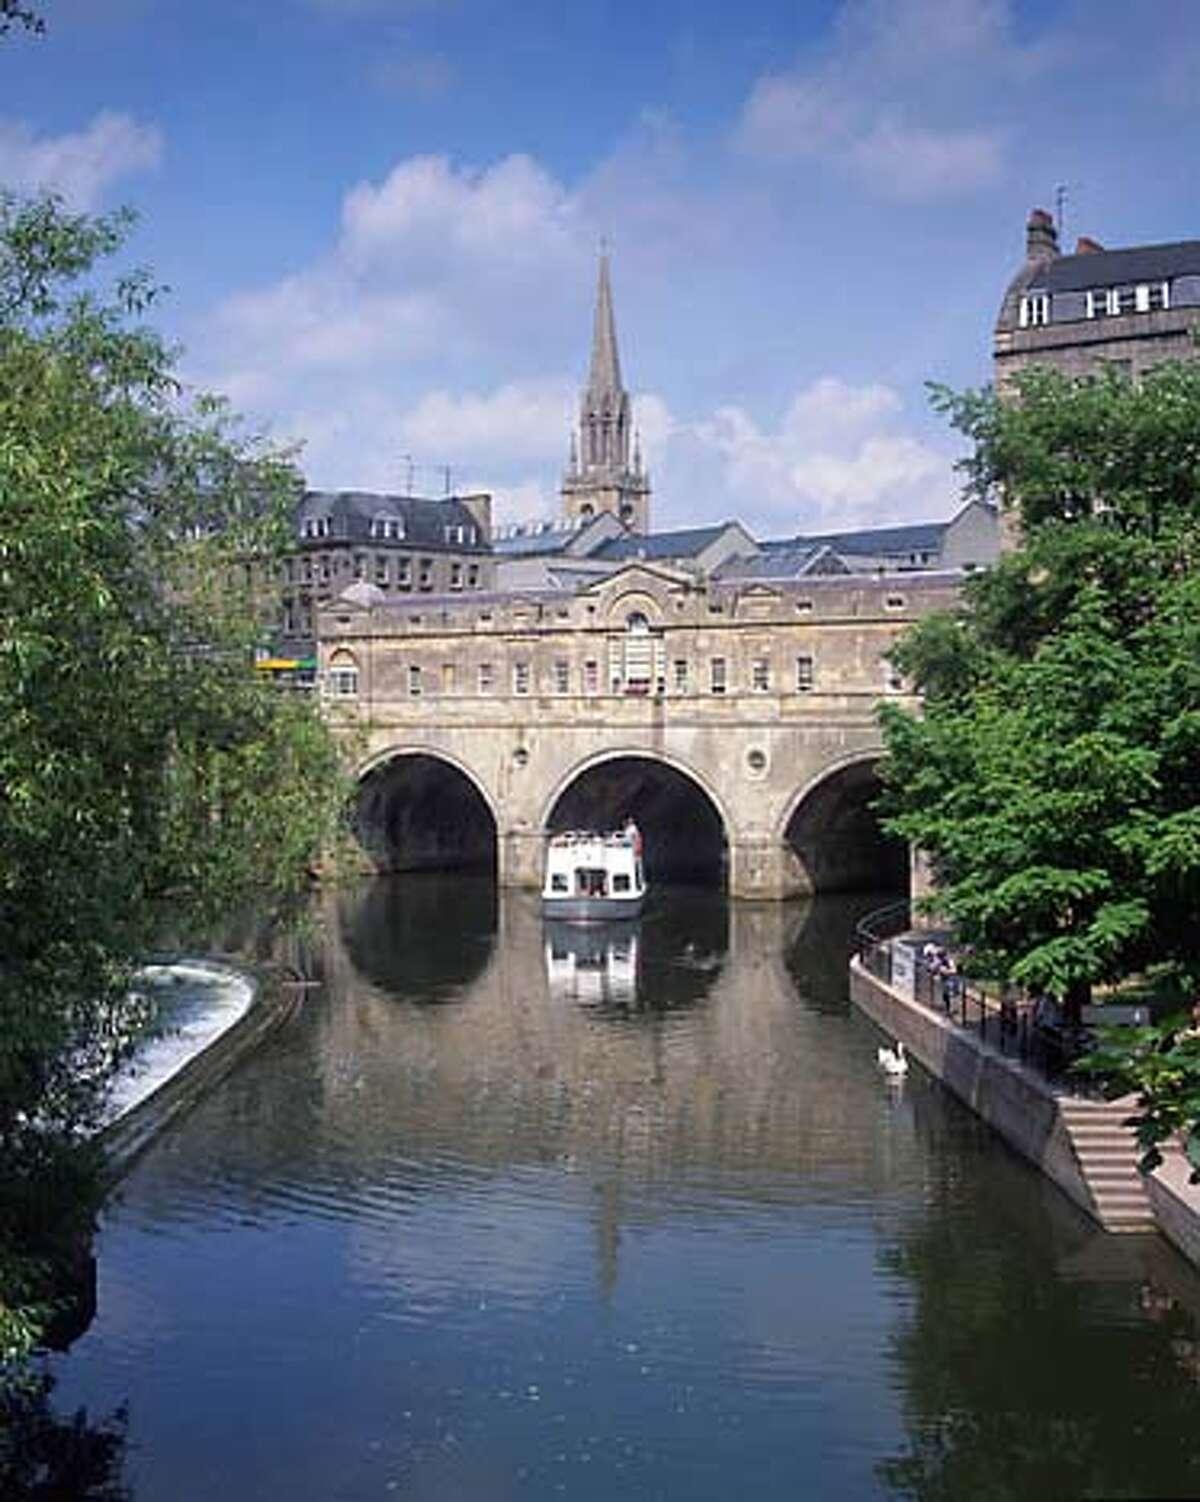 TRAVEL-BATH, ENGLAND (received 7/31/03) -- Pulteney Bridge and the River Avon, Bath. Credit: Bath Tourist Board